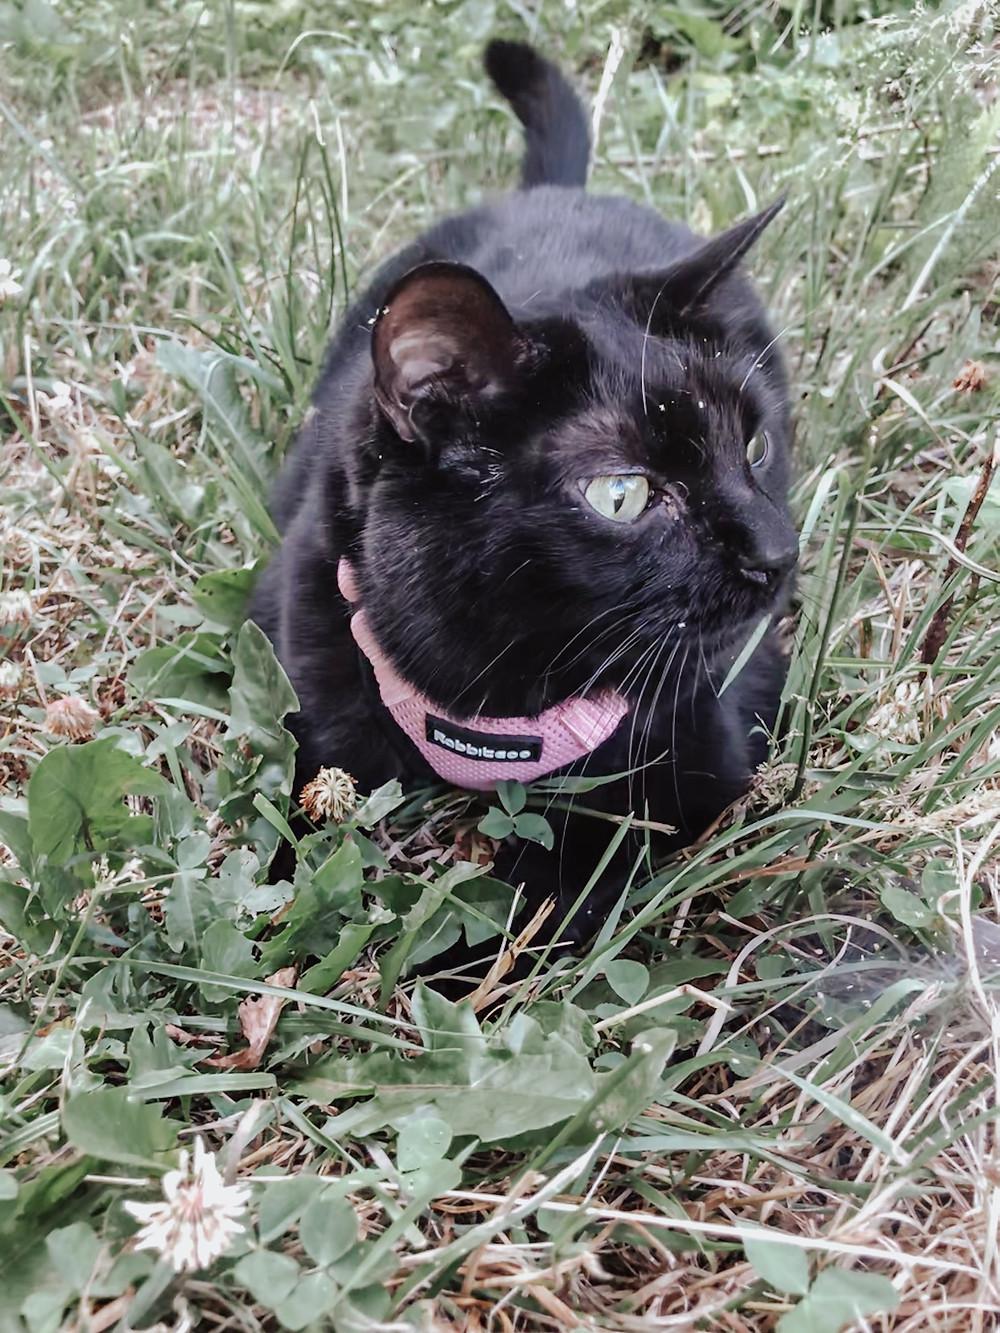 Tempe enjoying the outdoors